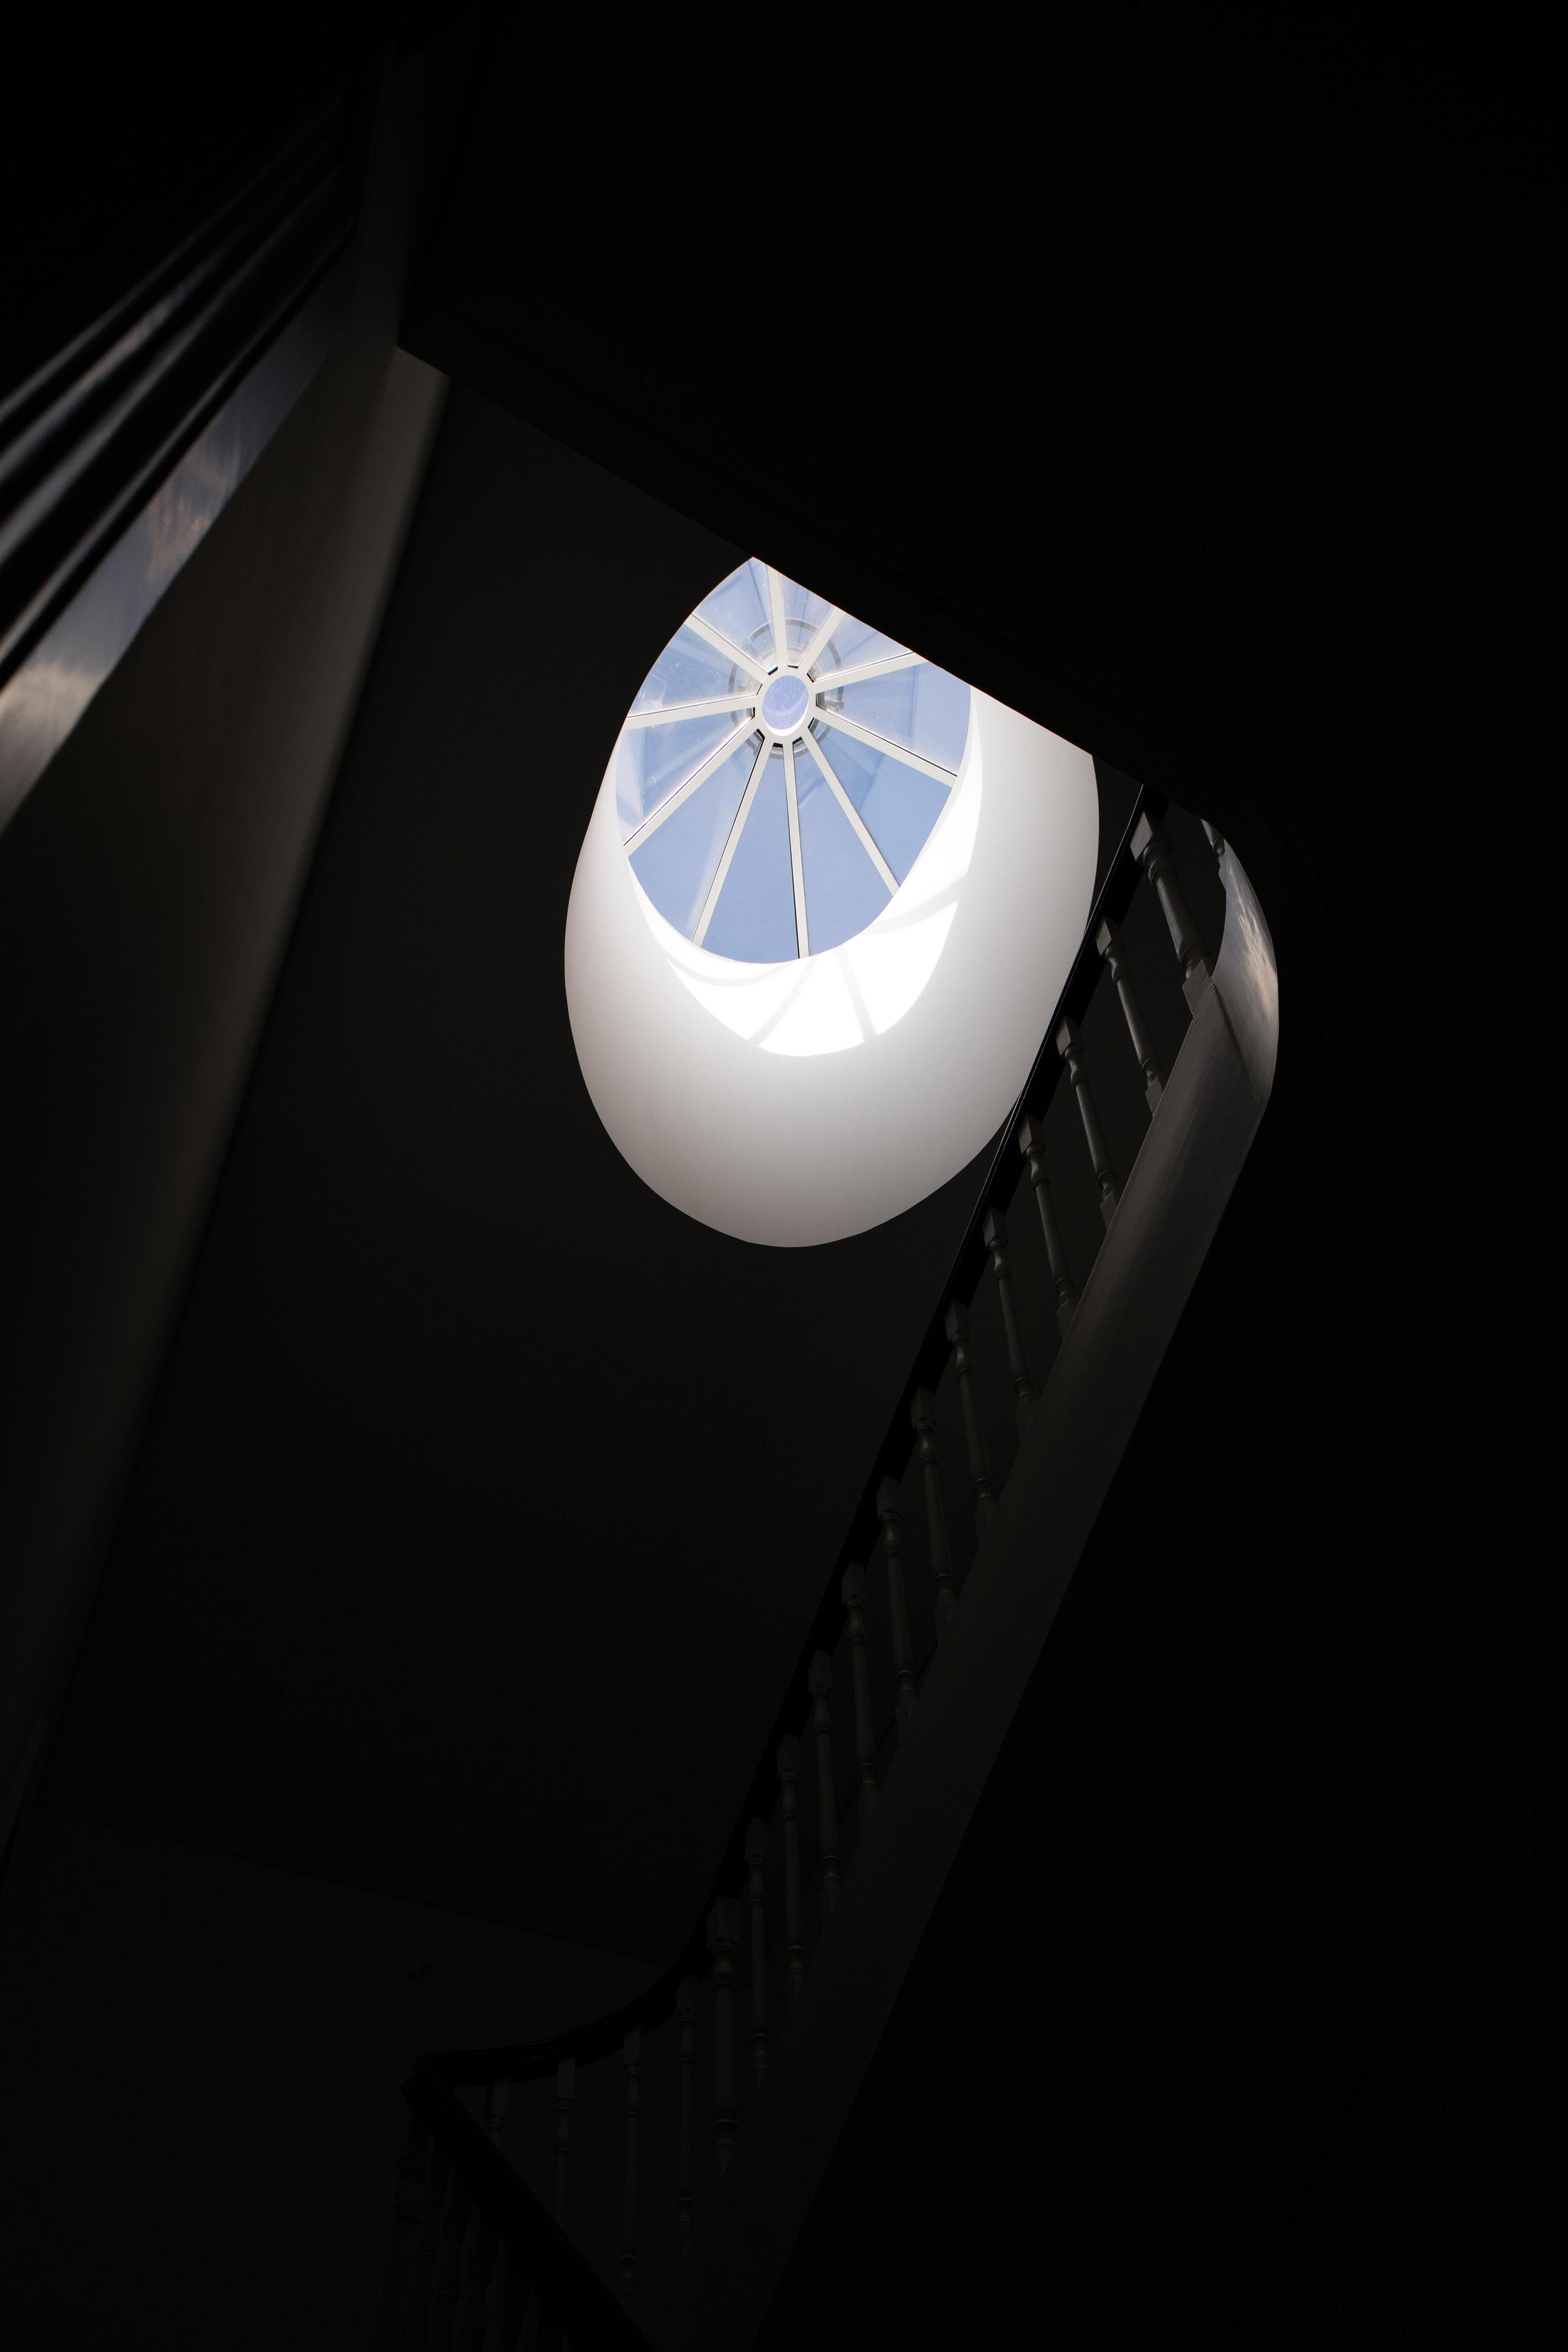 casa-pinheiro-manso-15